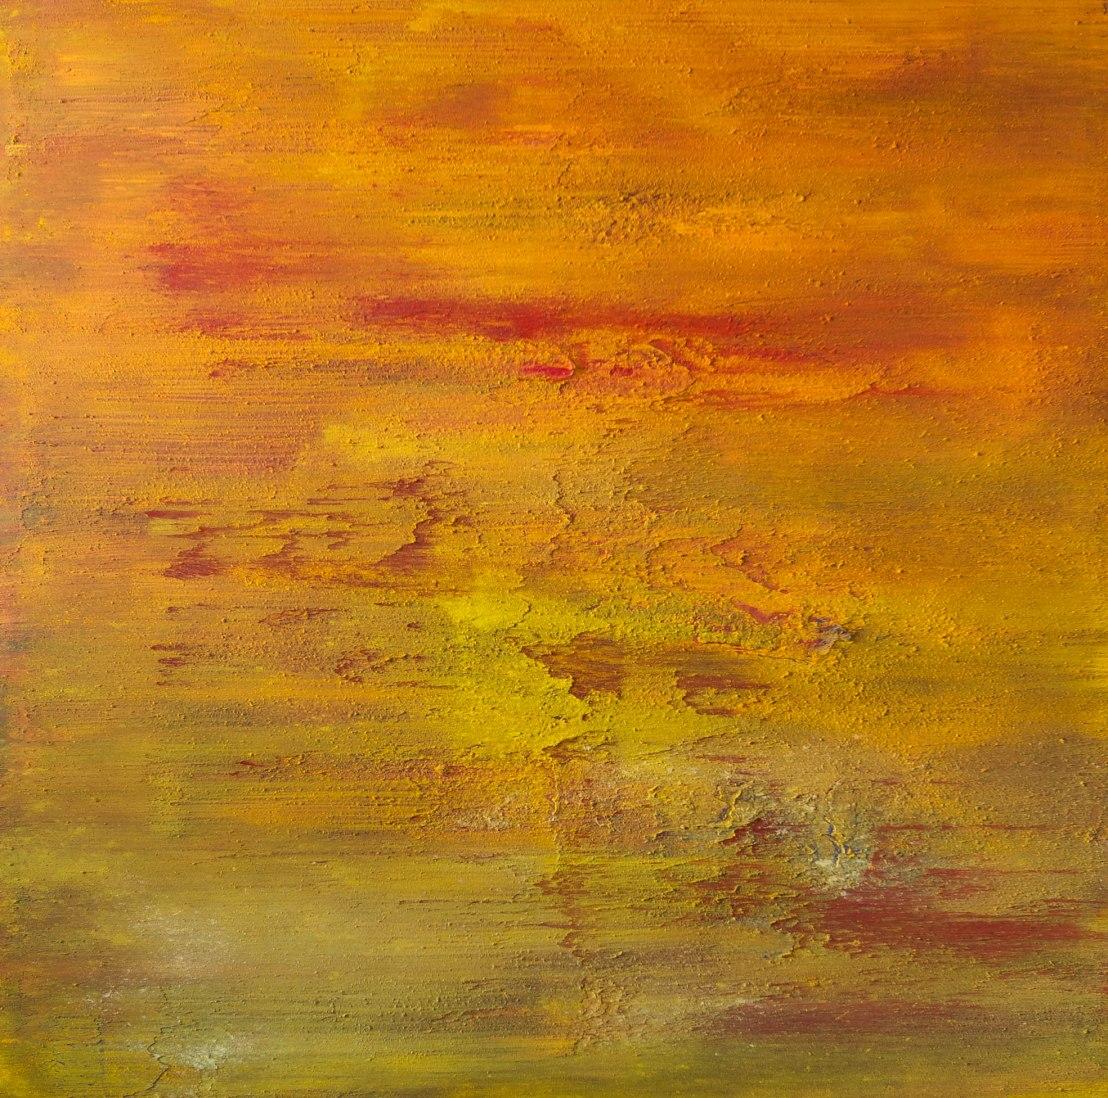 Alberto Reguera 2017 150 x 150 x 13 cm (2)